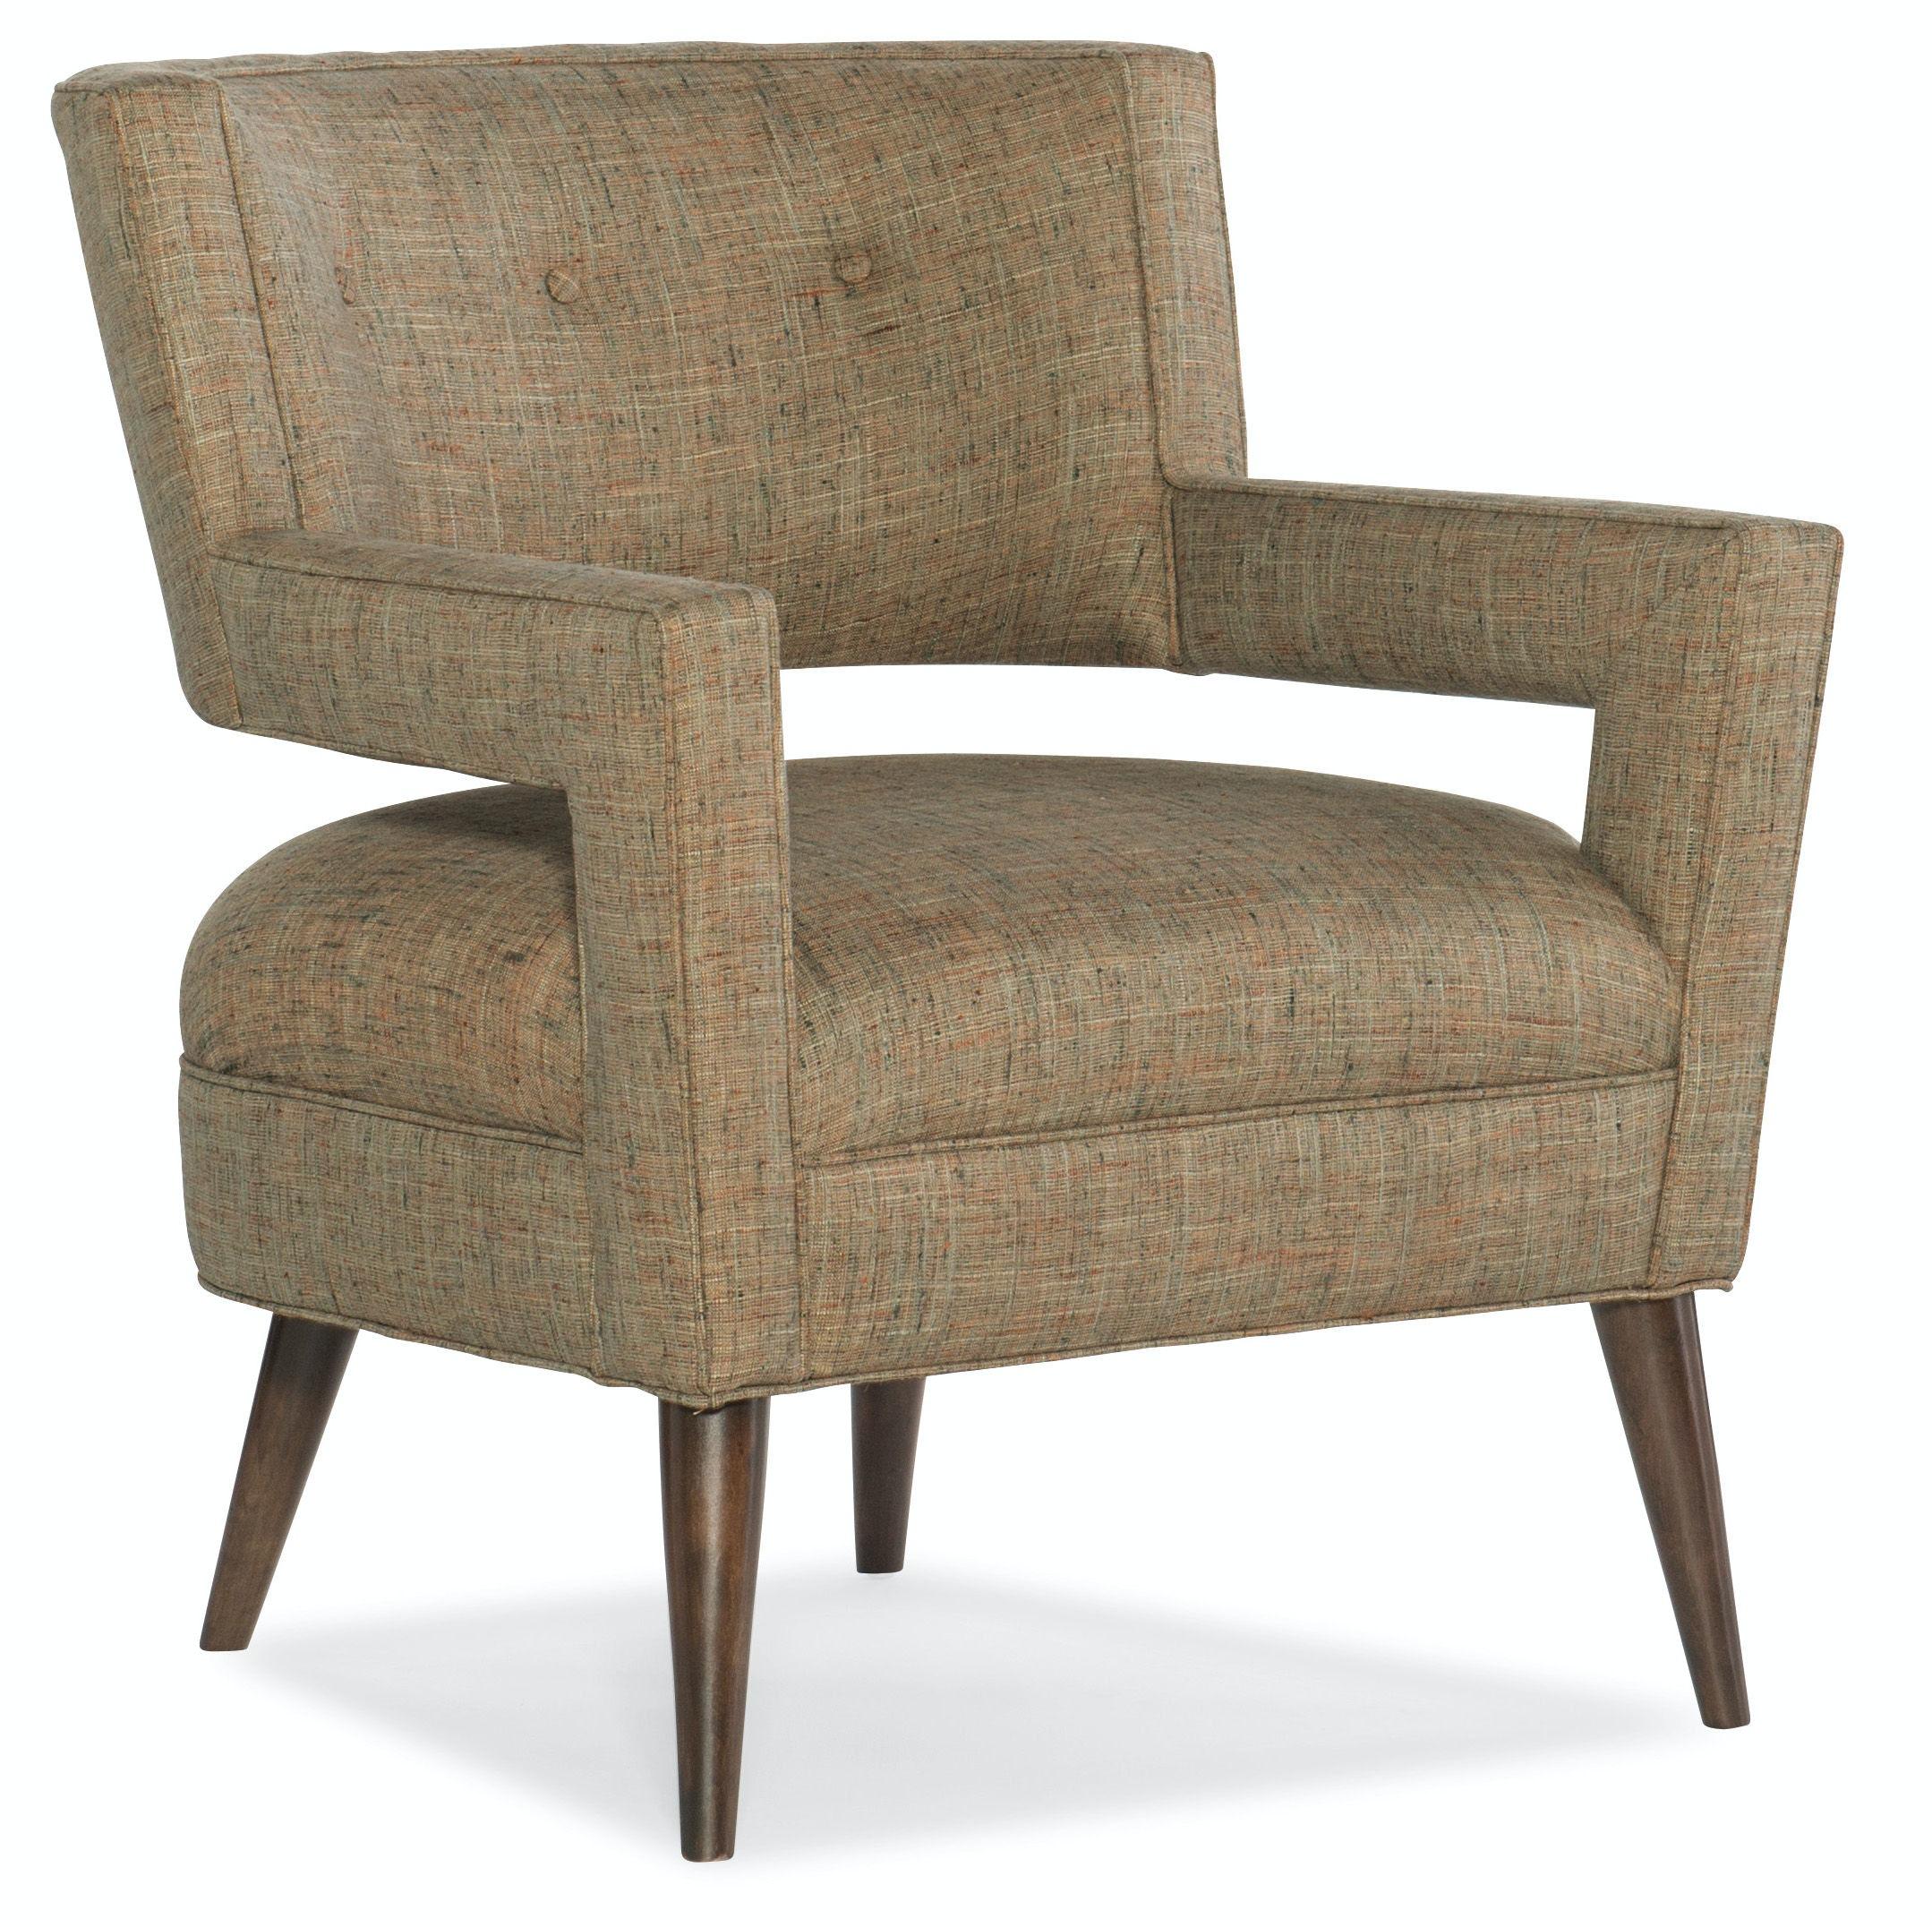 Sam Moore Living Room Harper Chair 1428 Schmitt Furniture Company